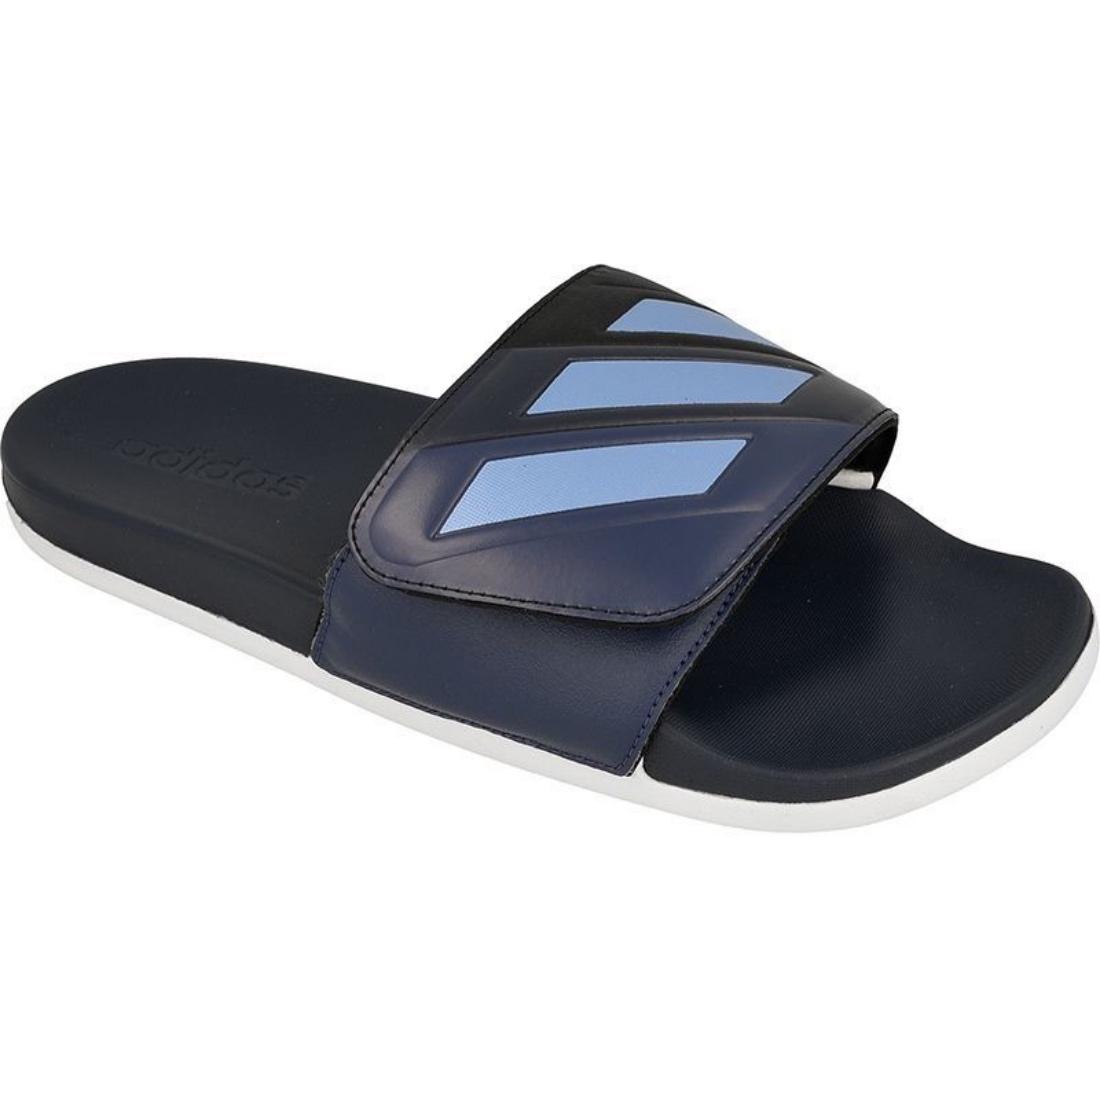 Adidas tongs de piscine sandales de plage adilette cf for Sandale adidas piscine